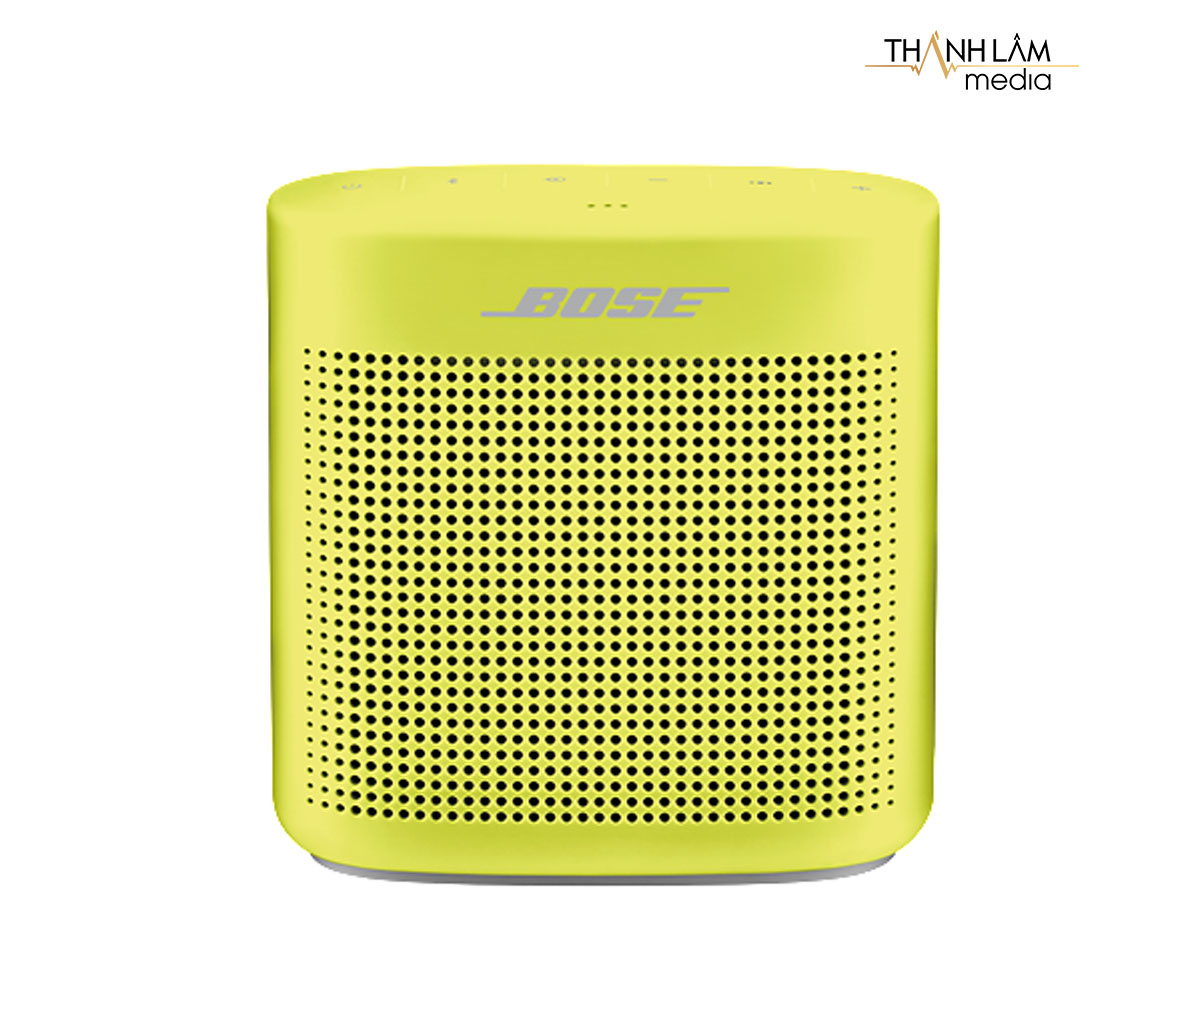 Loa-Bose-SoundLink-Color-2-Vang-2